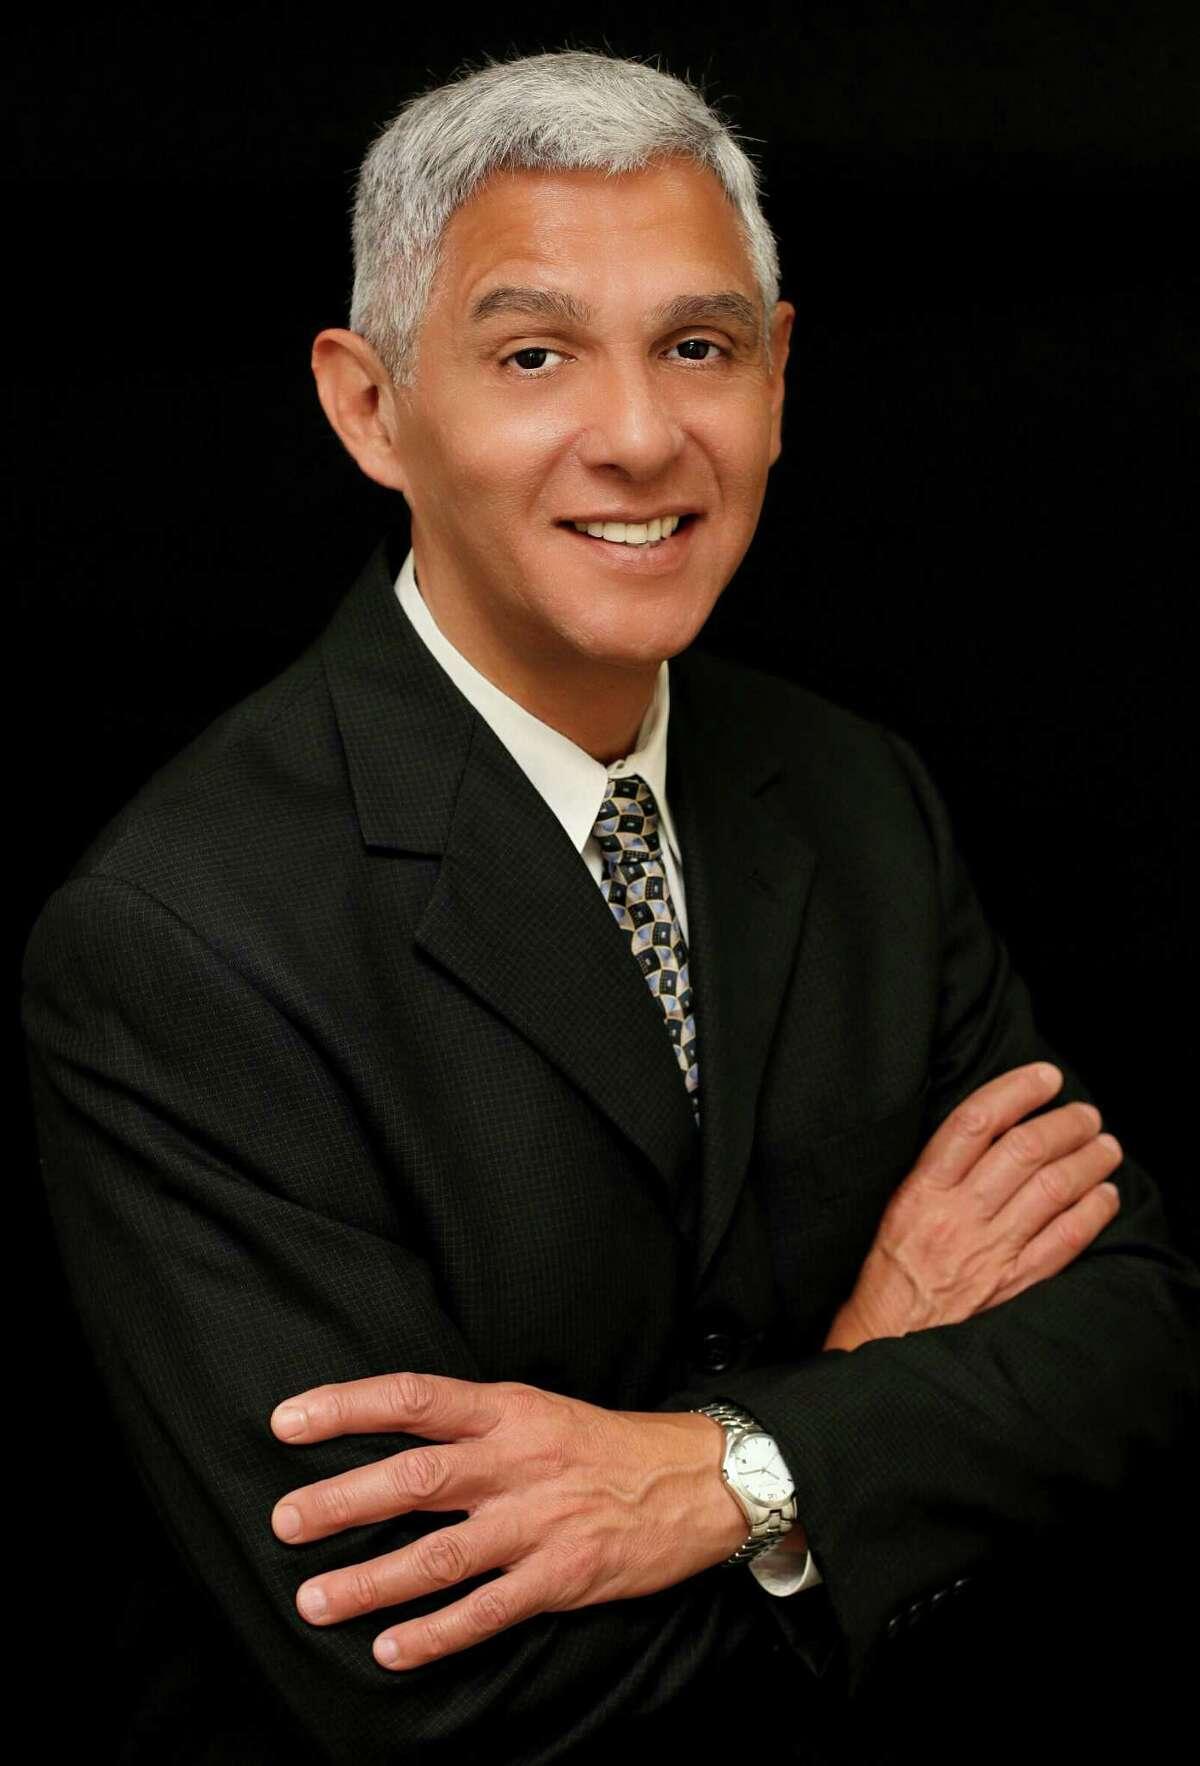 Robert Gallegos, 54 Occupation: detention officer at the Harris County jail Website: voterobertgallegos.com/